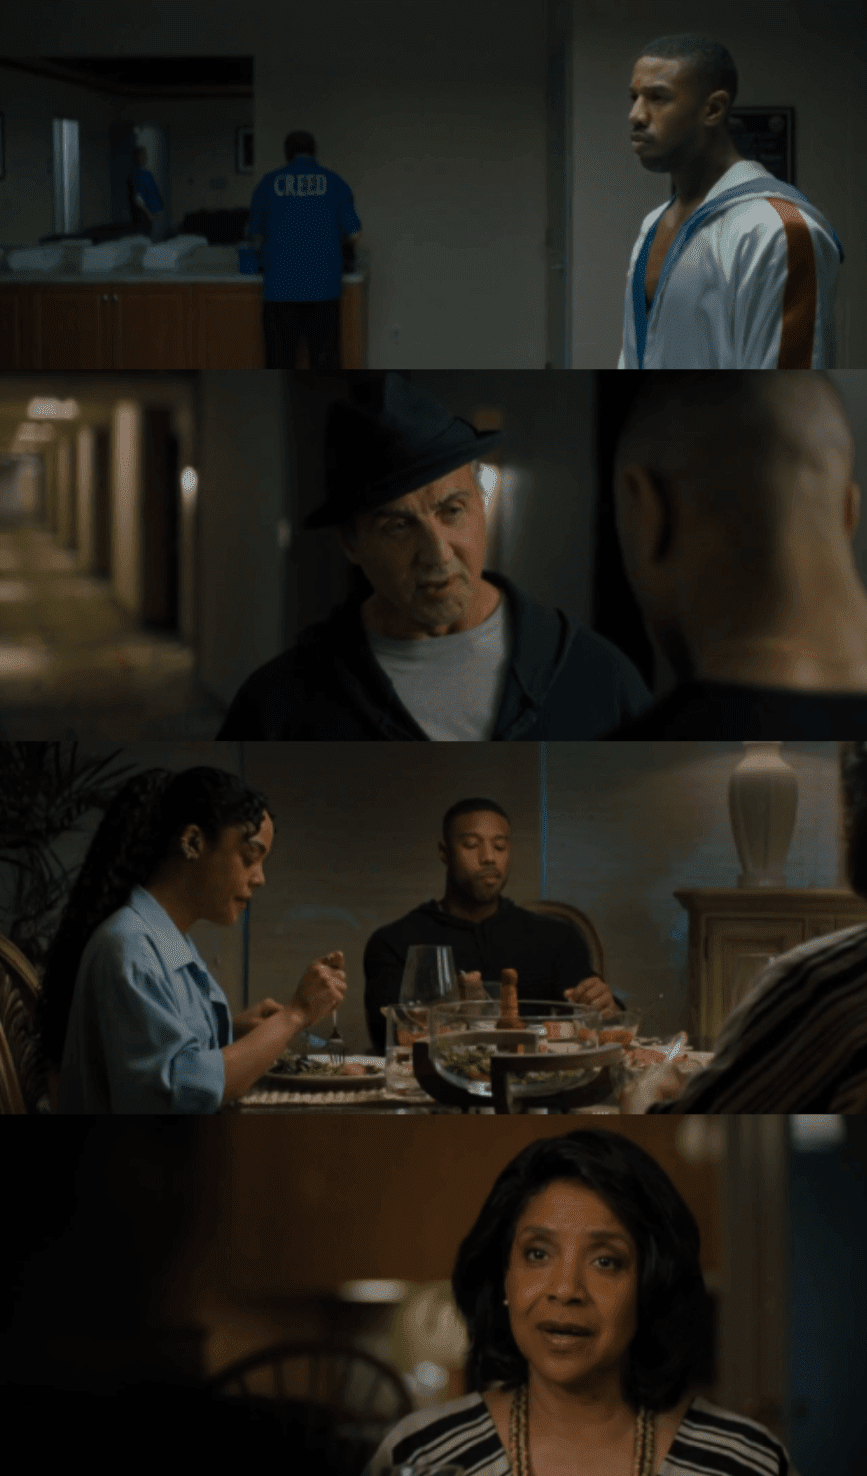 Creed 2 screenshots